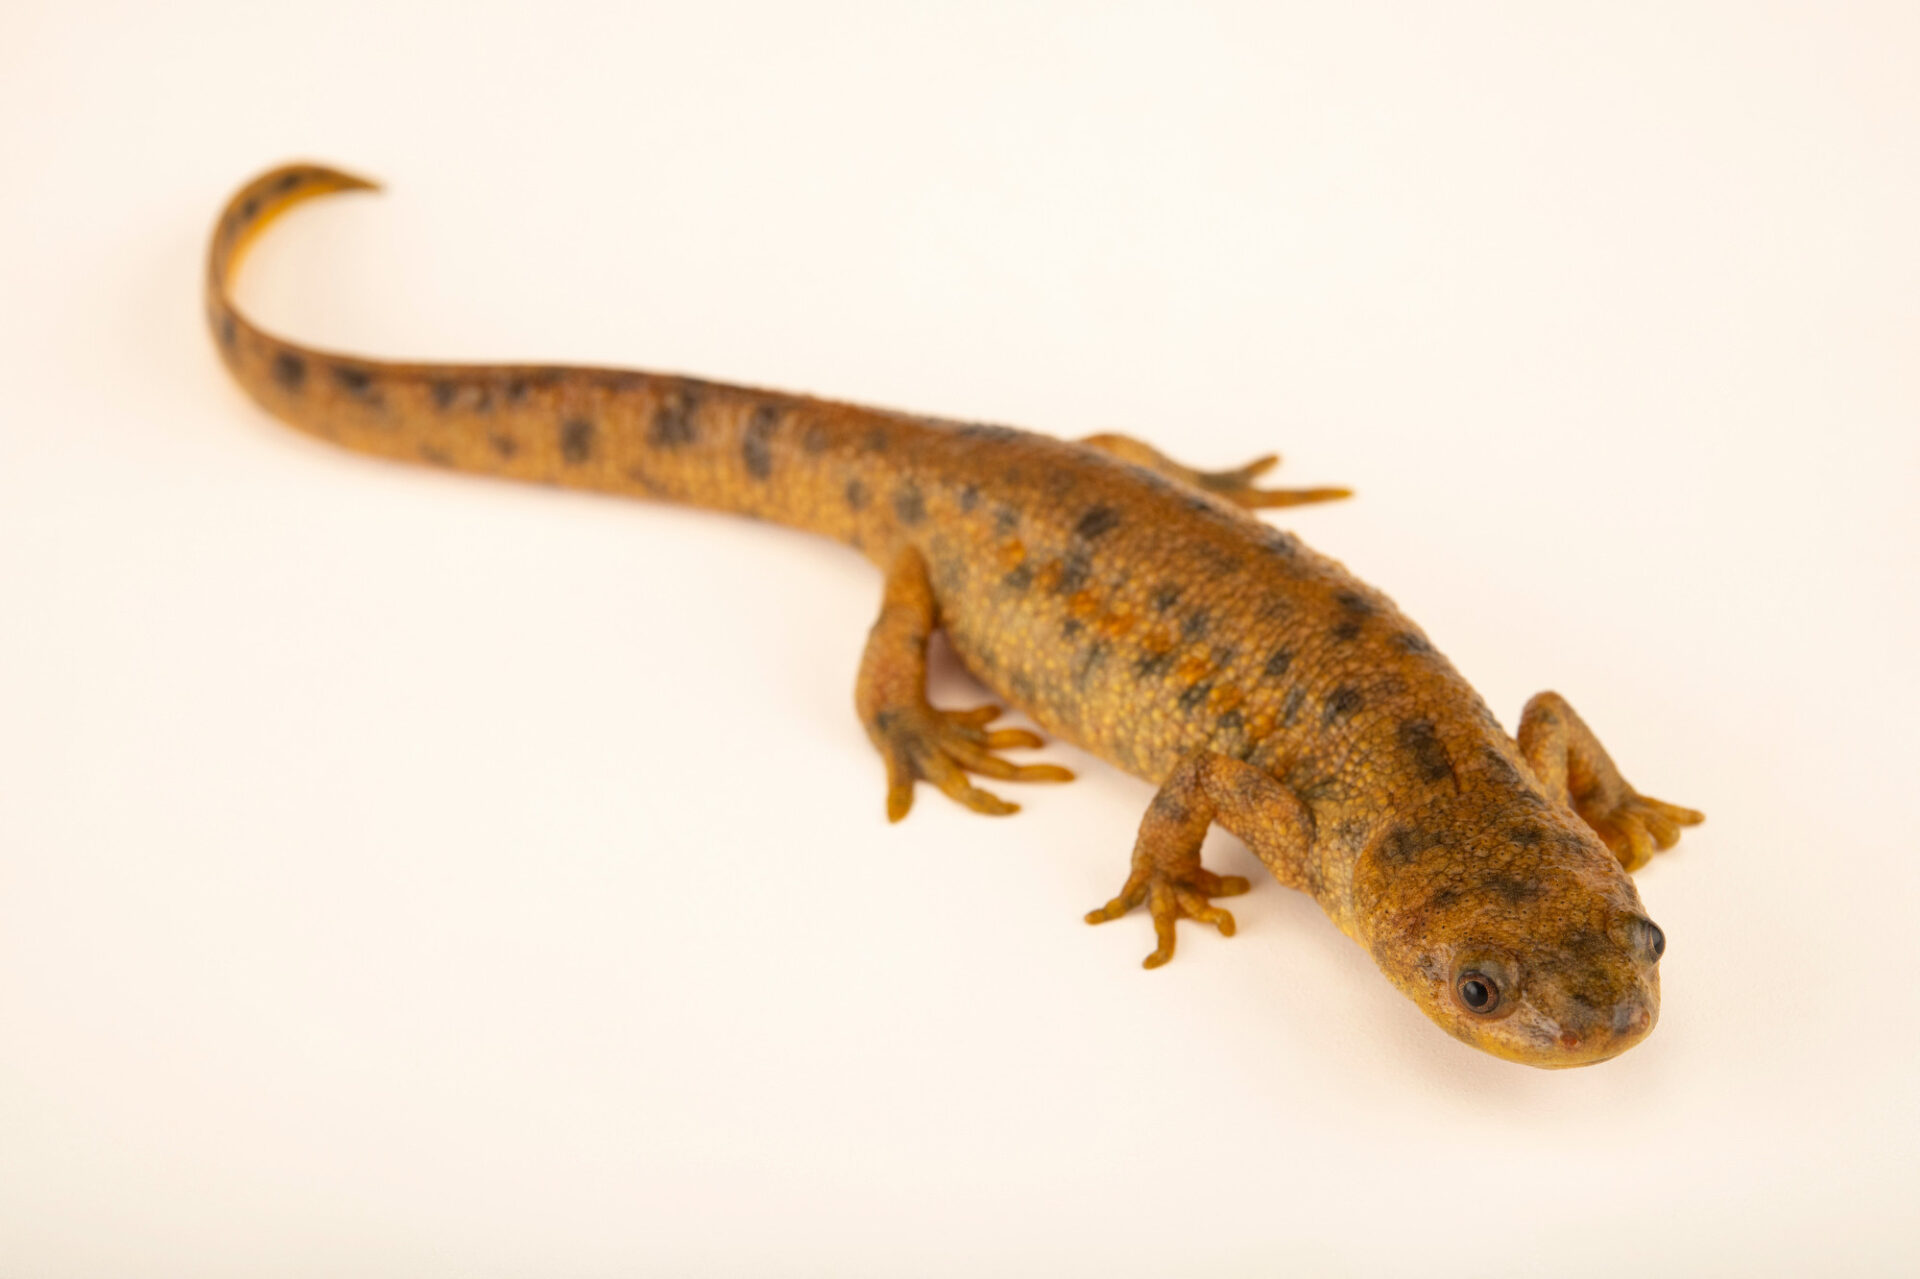 Photo: An Algerian ribbed newt (Pleurodeles nebulosus) at Aquarium Berlin.